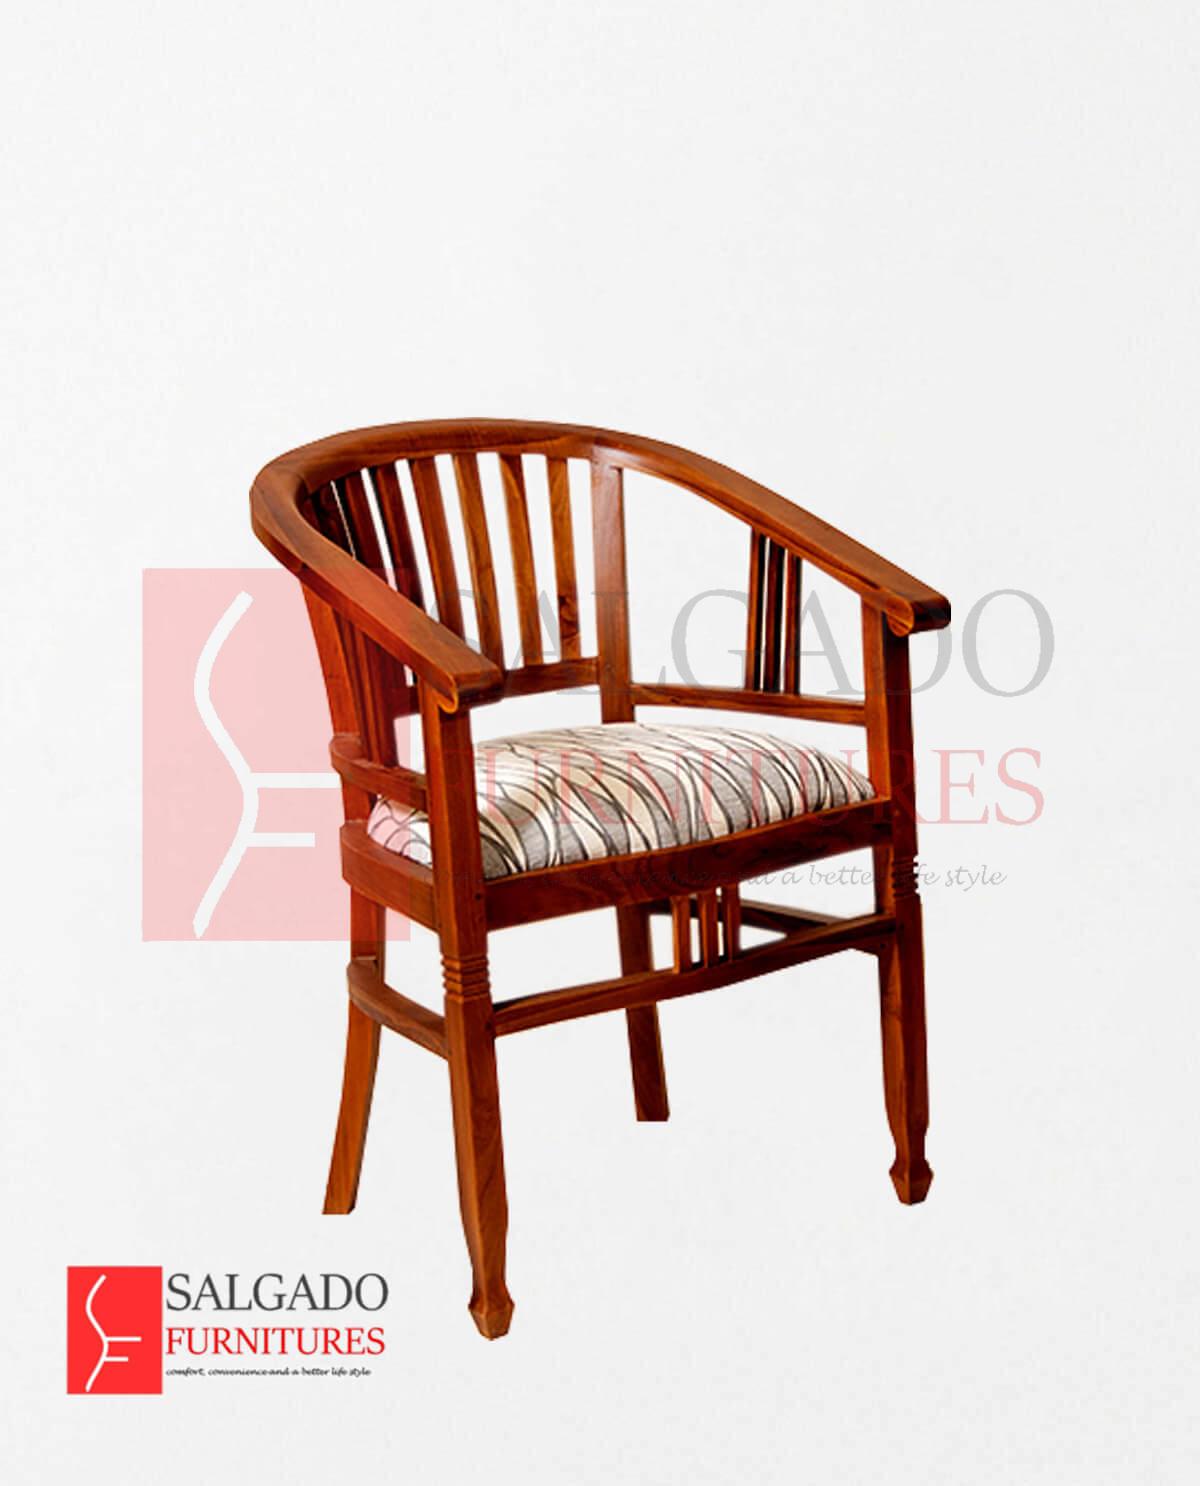 varandha-chair-moratuwa